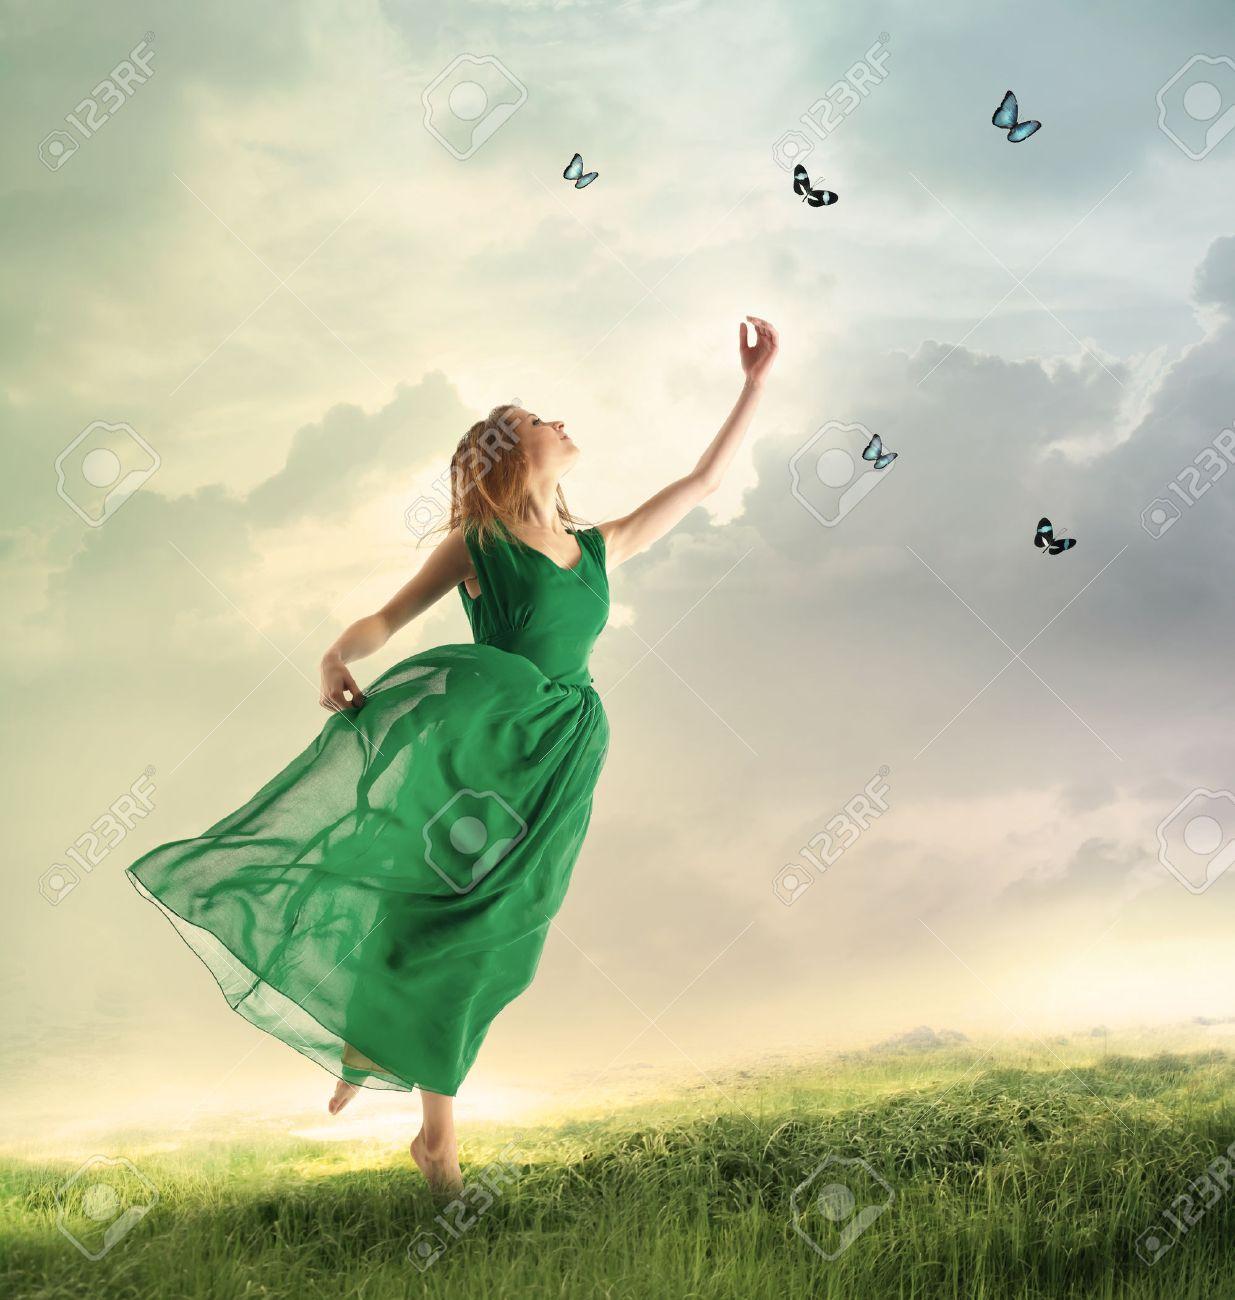 ===Que es para ti volar?...=== - Página 2 34683160-Beautiful-woman-in-a-green-dress-chasing-butterflies-on-a-mountain-Stock-Photo